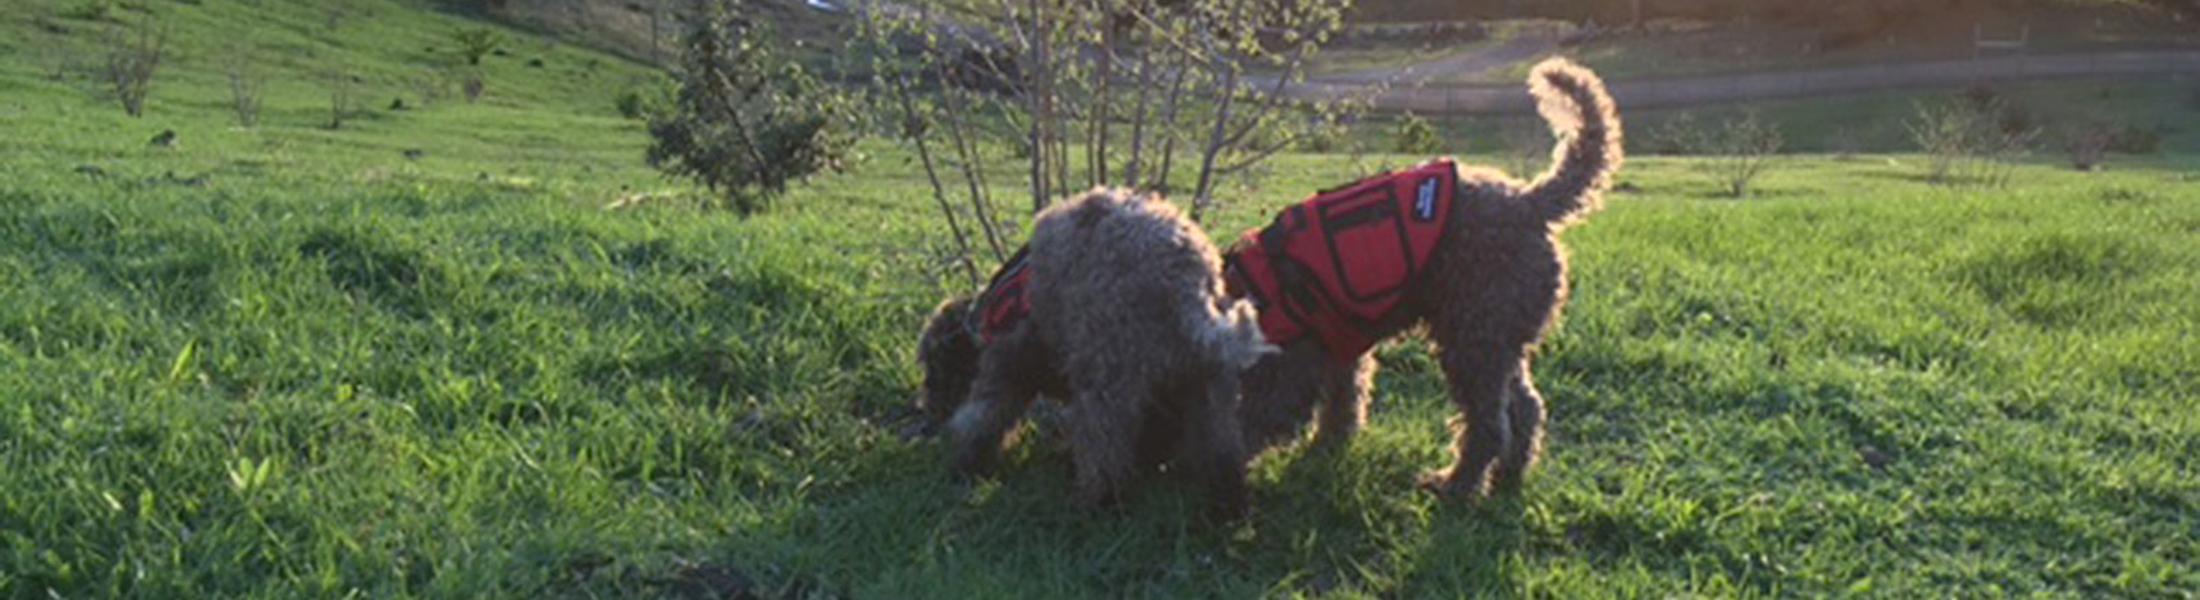 Truffle Dog Trainning